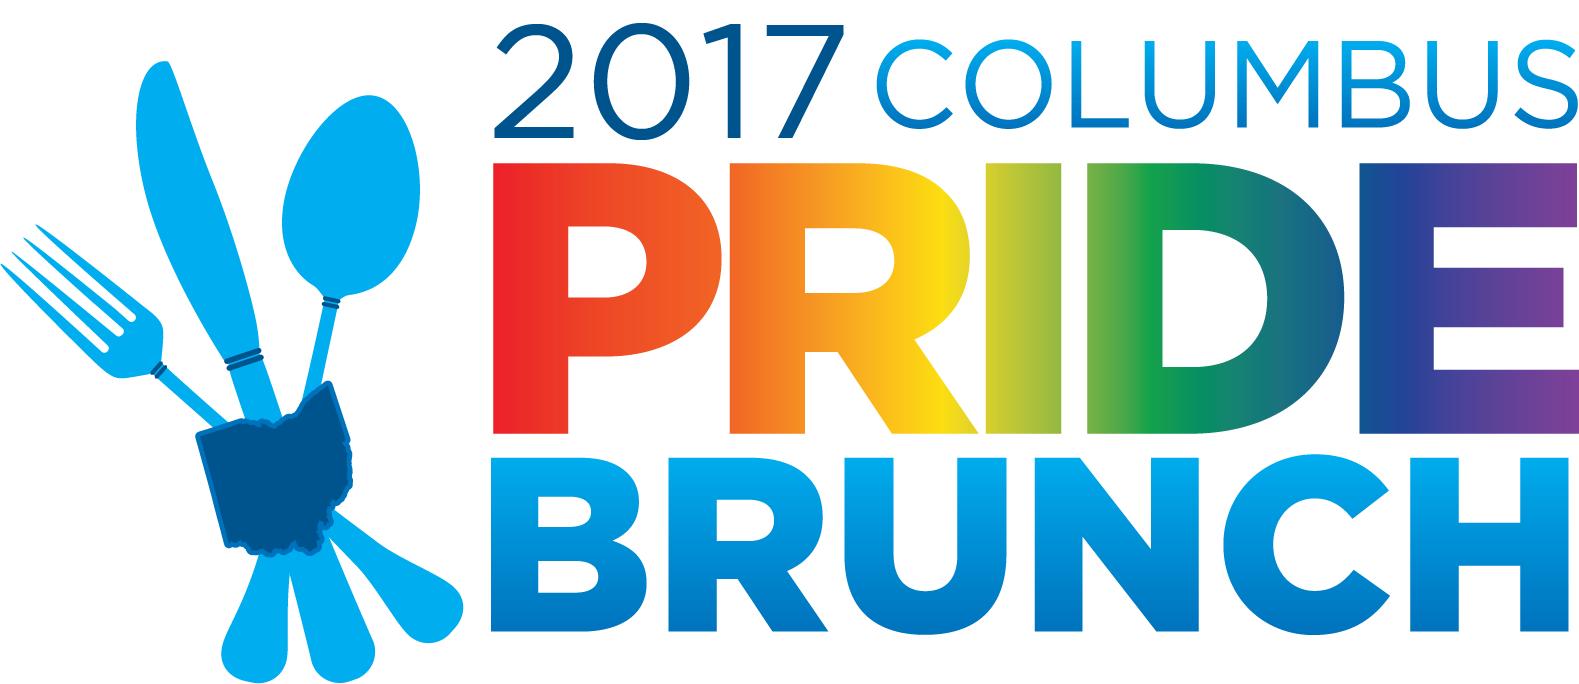 Columbus pride stonewall. Brunch clipart lgbt